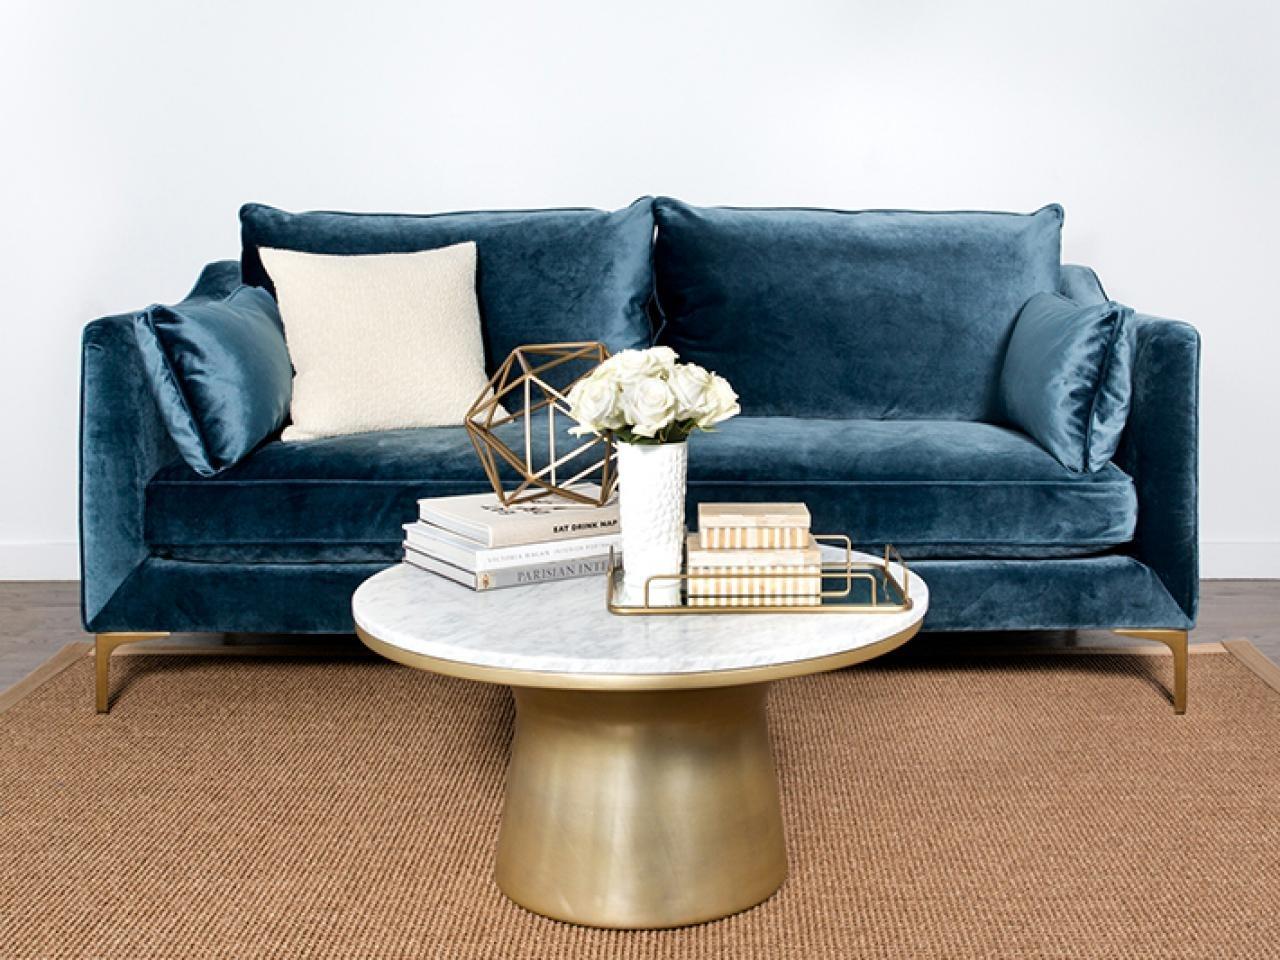 11 Of The Best Velvet Sofas To Decorate With   Hgtv's Decorating Regarding Velvet Sofas (Gallery 5 of 10)